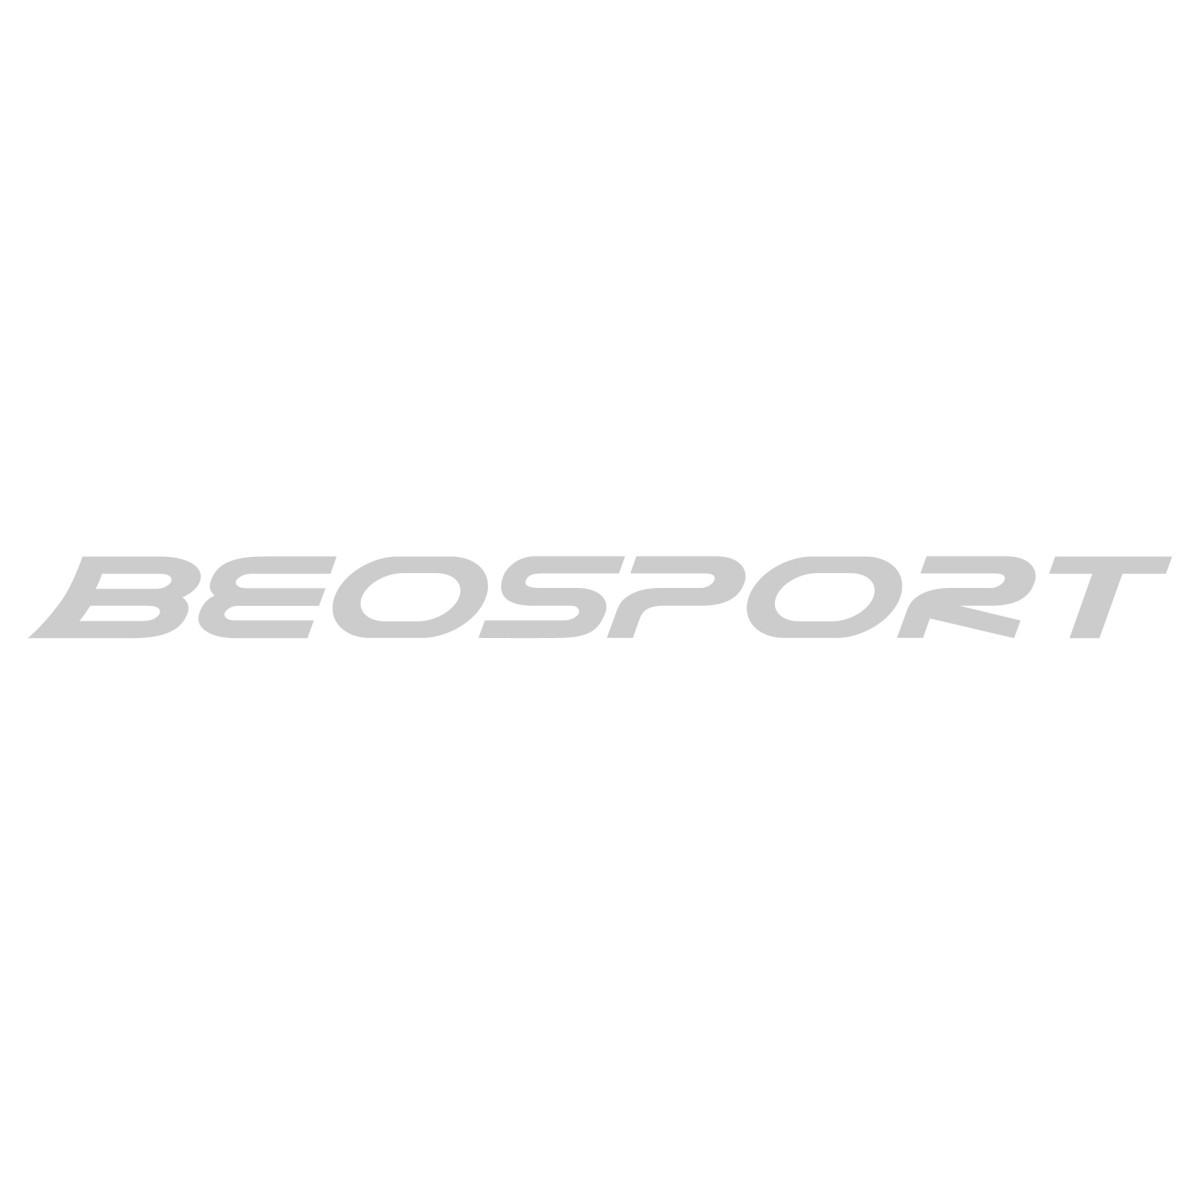 Skechers Bobs Plush - Preps Cool espadrile